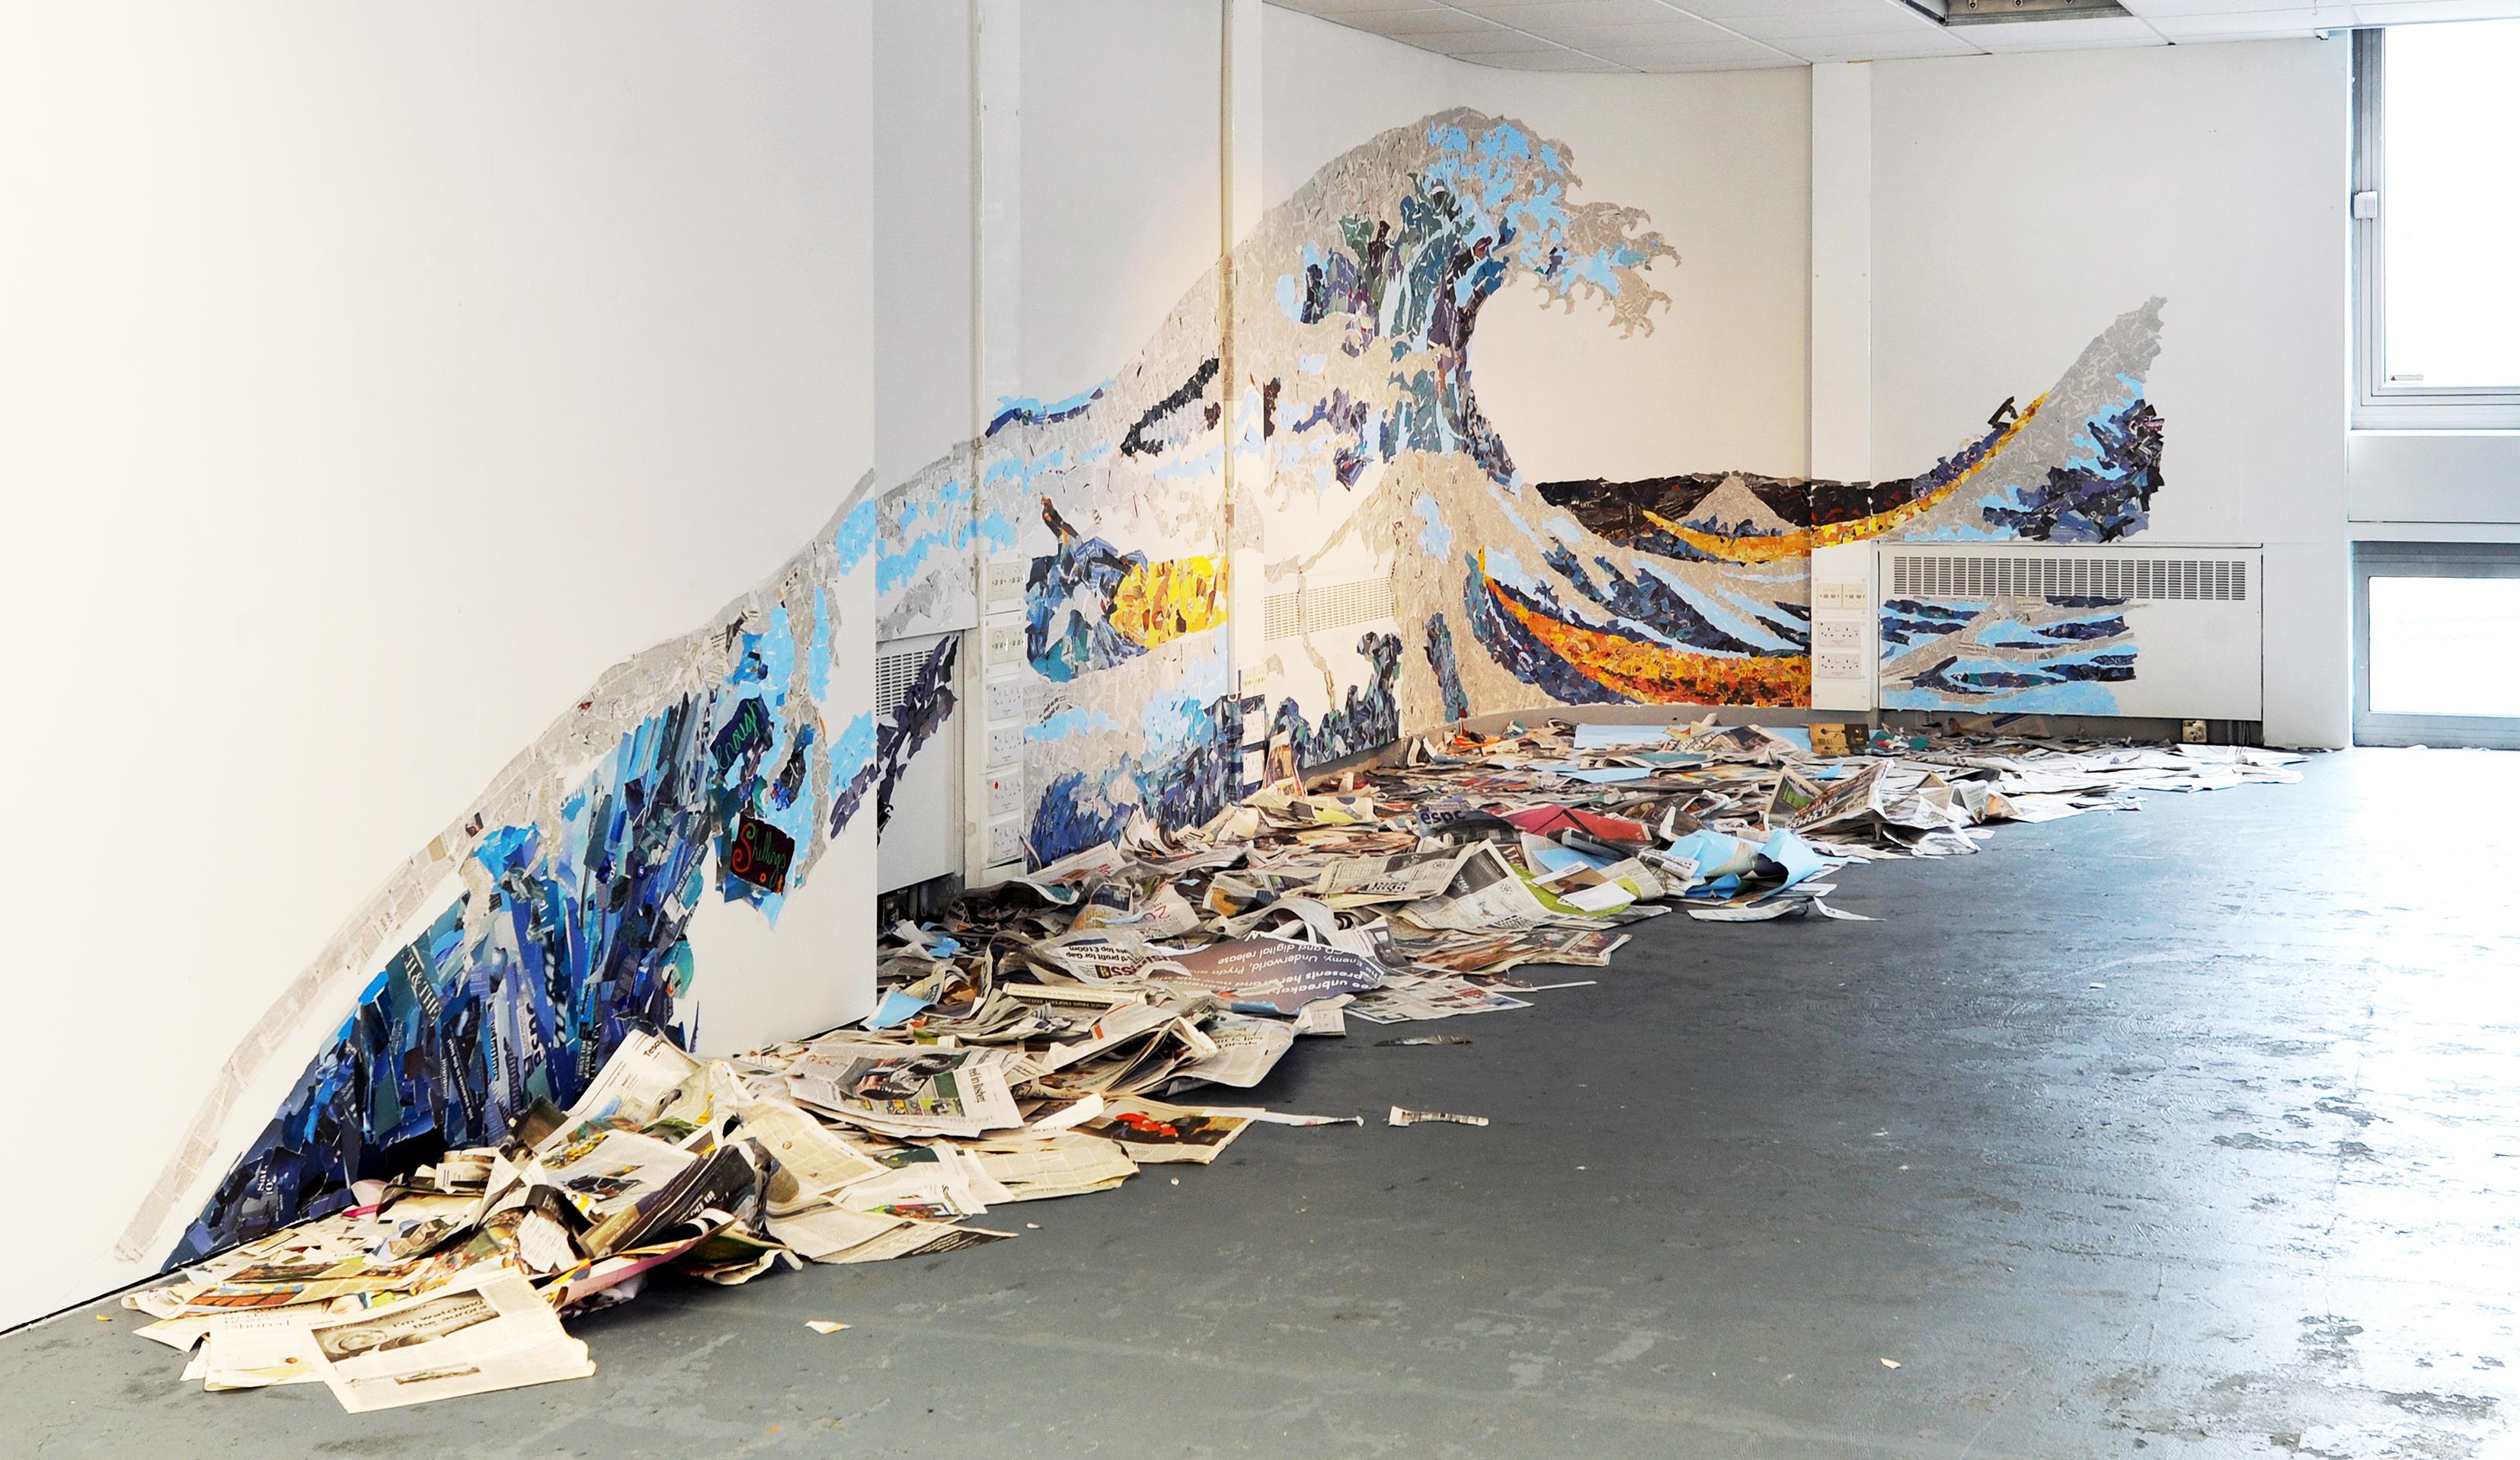 Janie Nicoll, 'Tsunami'. Image: Alan Dimmick